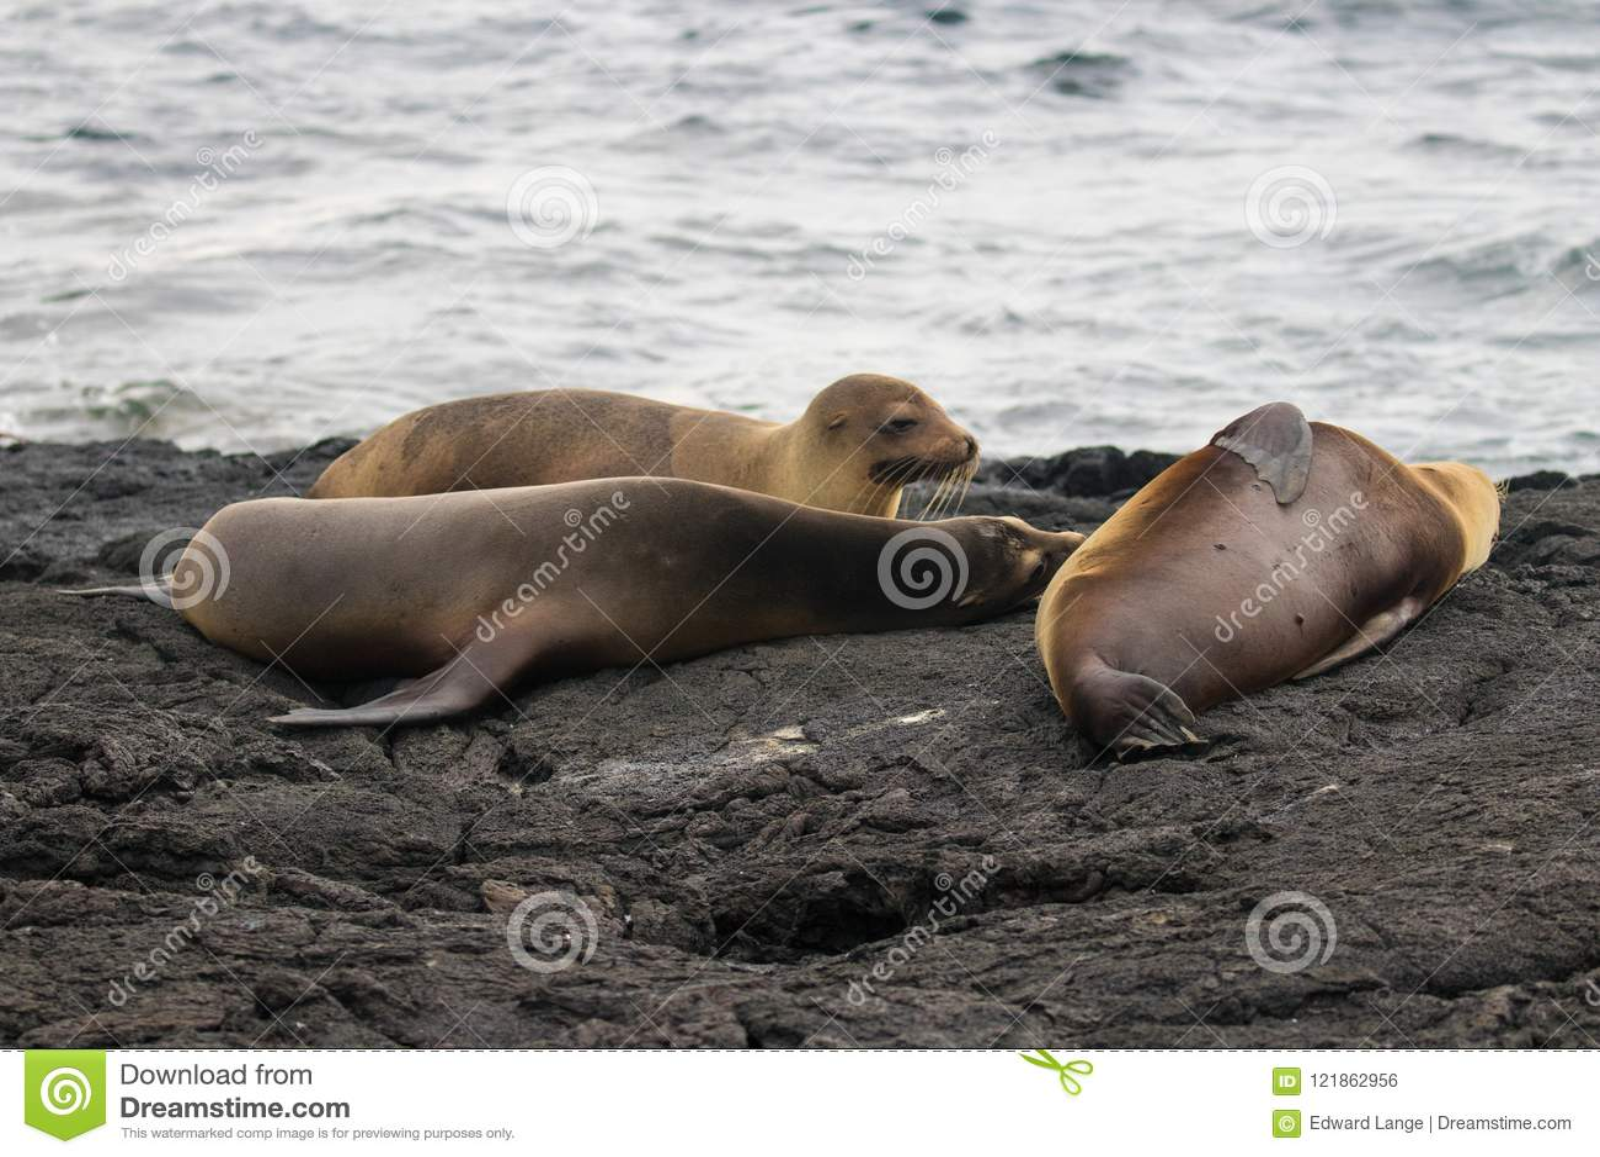 Морские котики на островах Галапагос